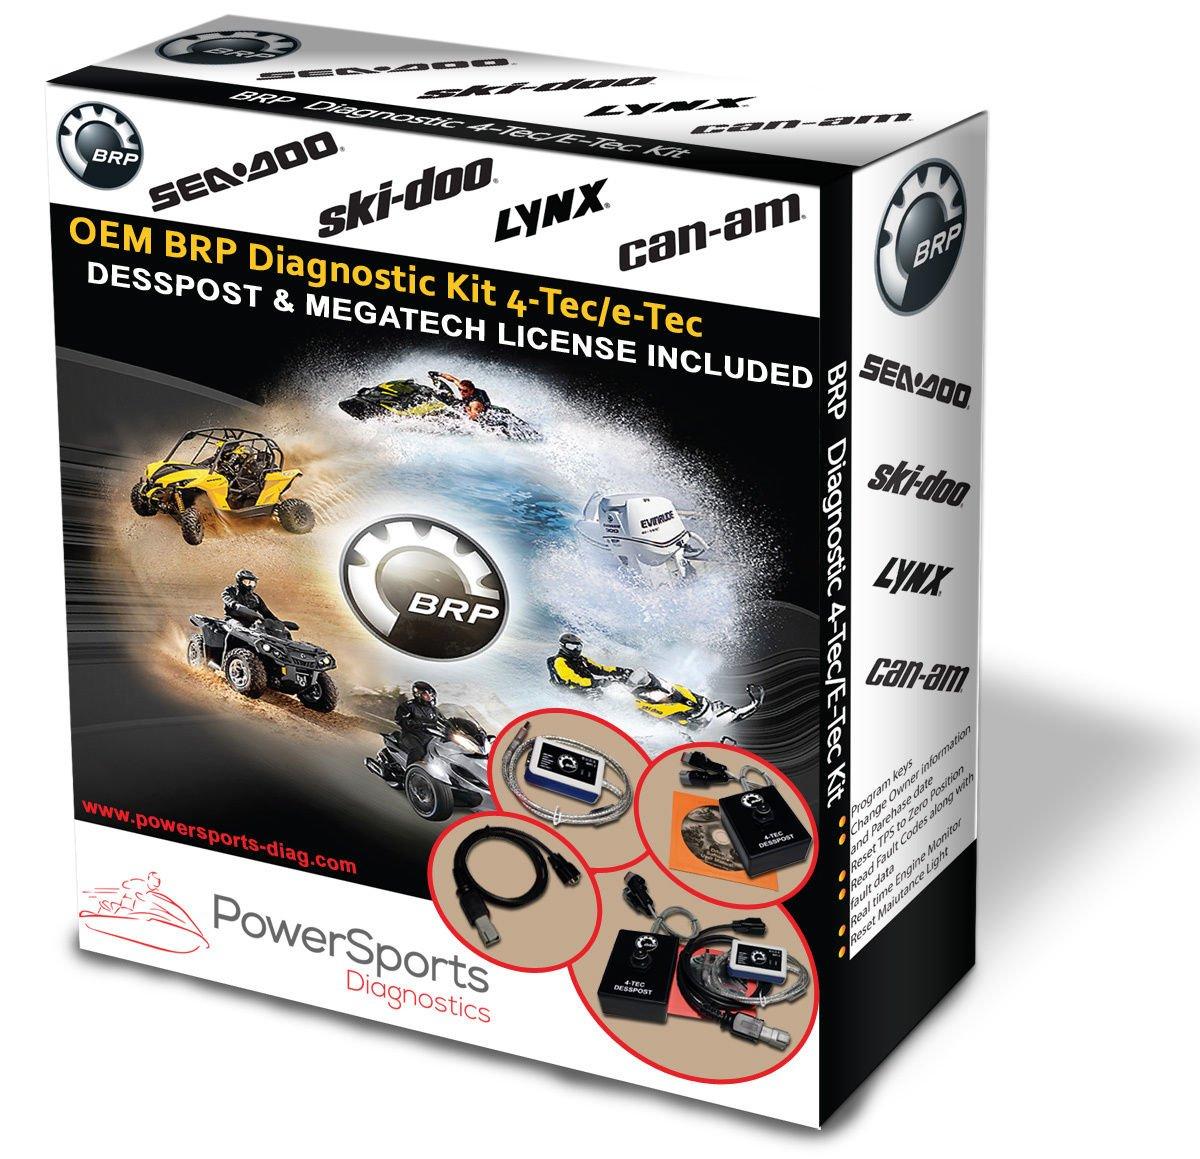 BRP BUDS / BUDS2 MPI-3 Diagnostic Kit 4TEC: Amazon.co.uk: Electronics